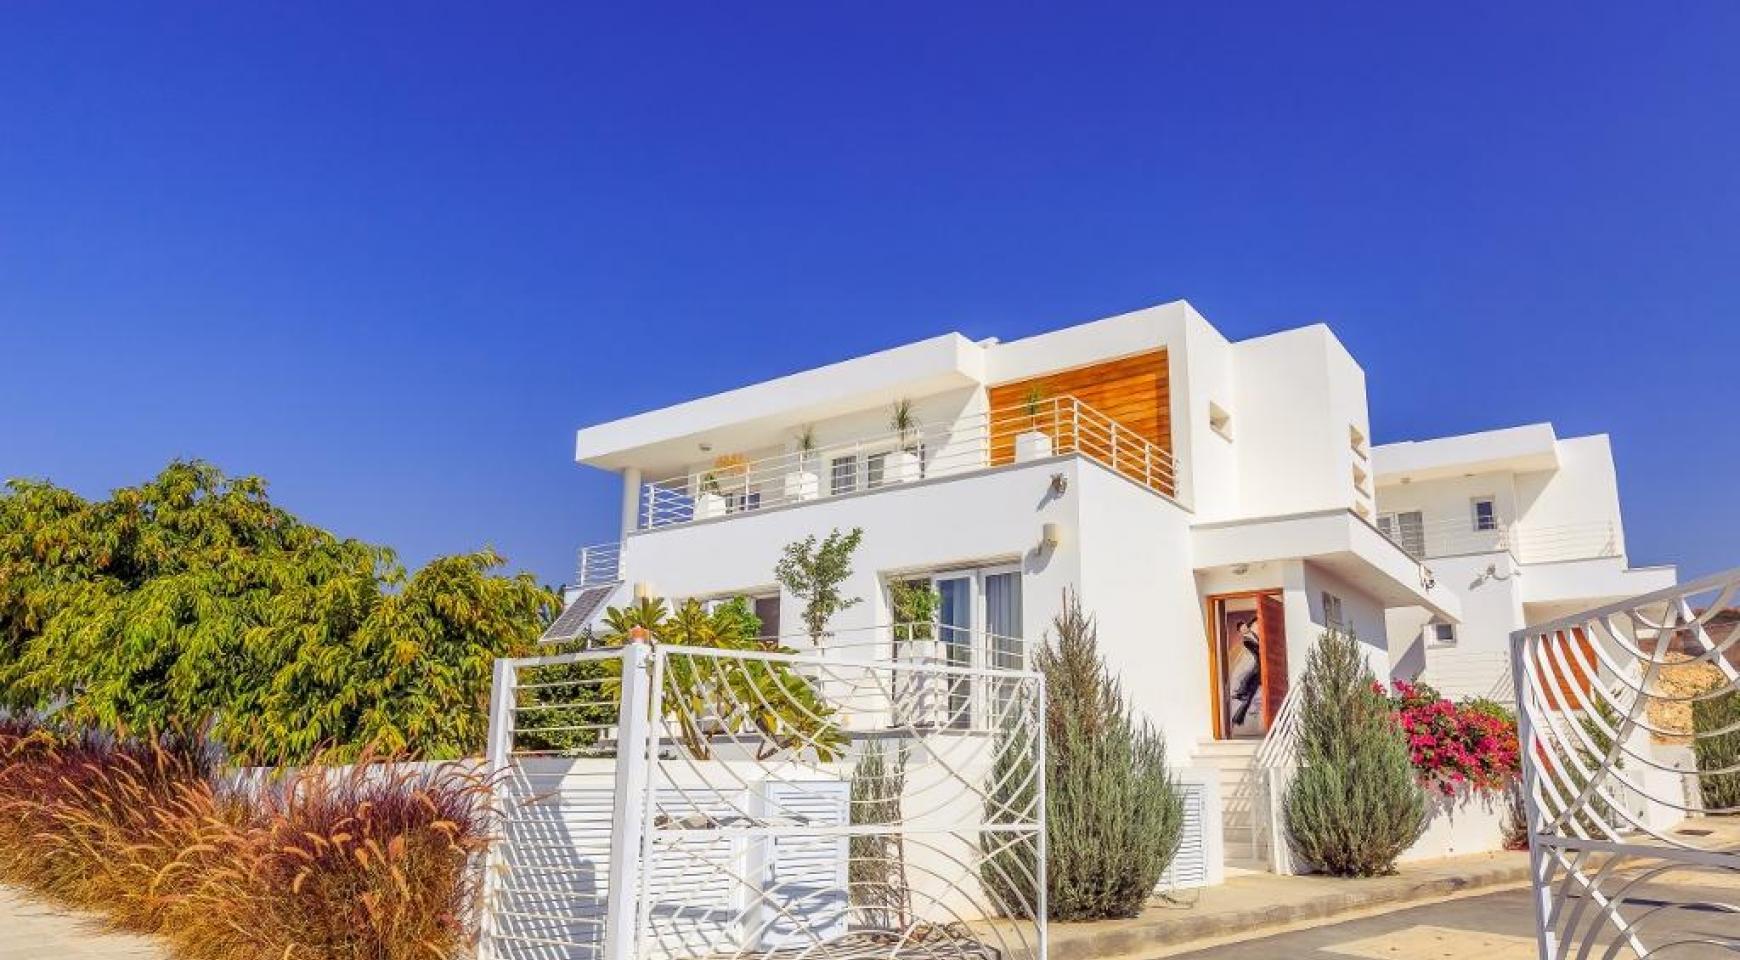 4-Спальная Вилла с Видом на Море в Районе Agios Tychonas - 4